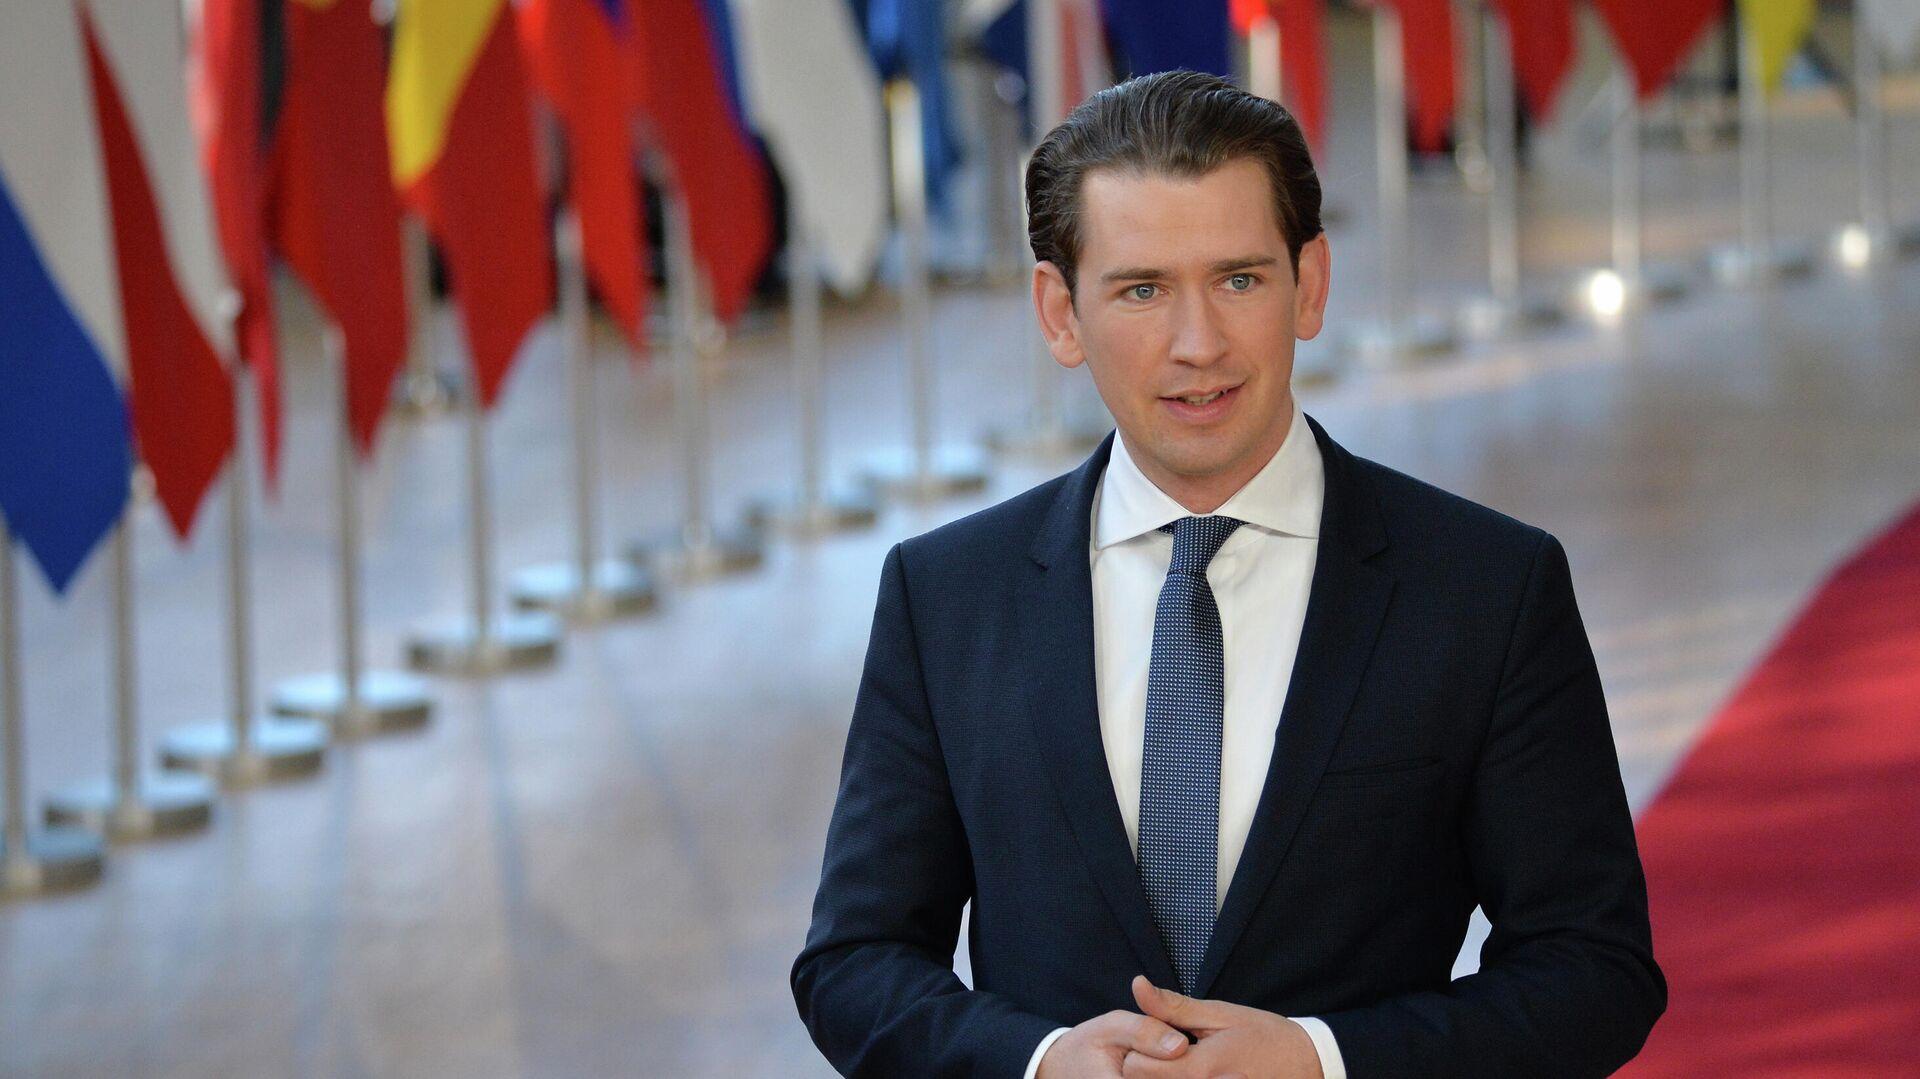 Канцлер Австрии Себастьян Курц на экстренном саммите ЕС по Brexit в Брюсселе - РИА Новости, 1920, 27.08.2021